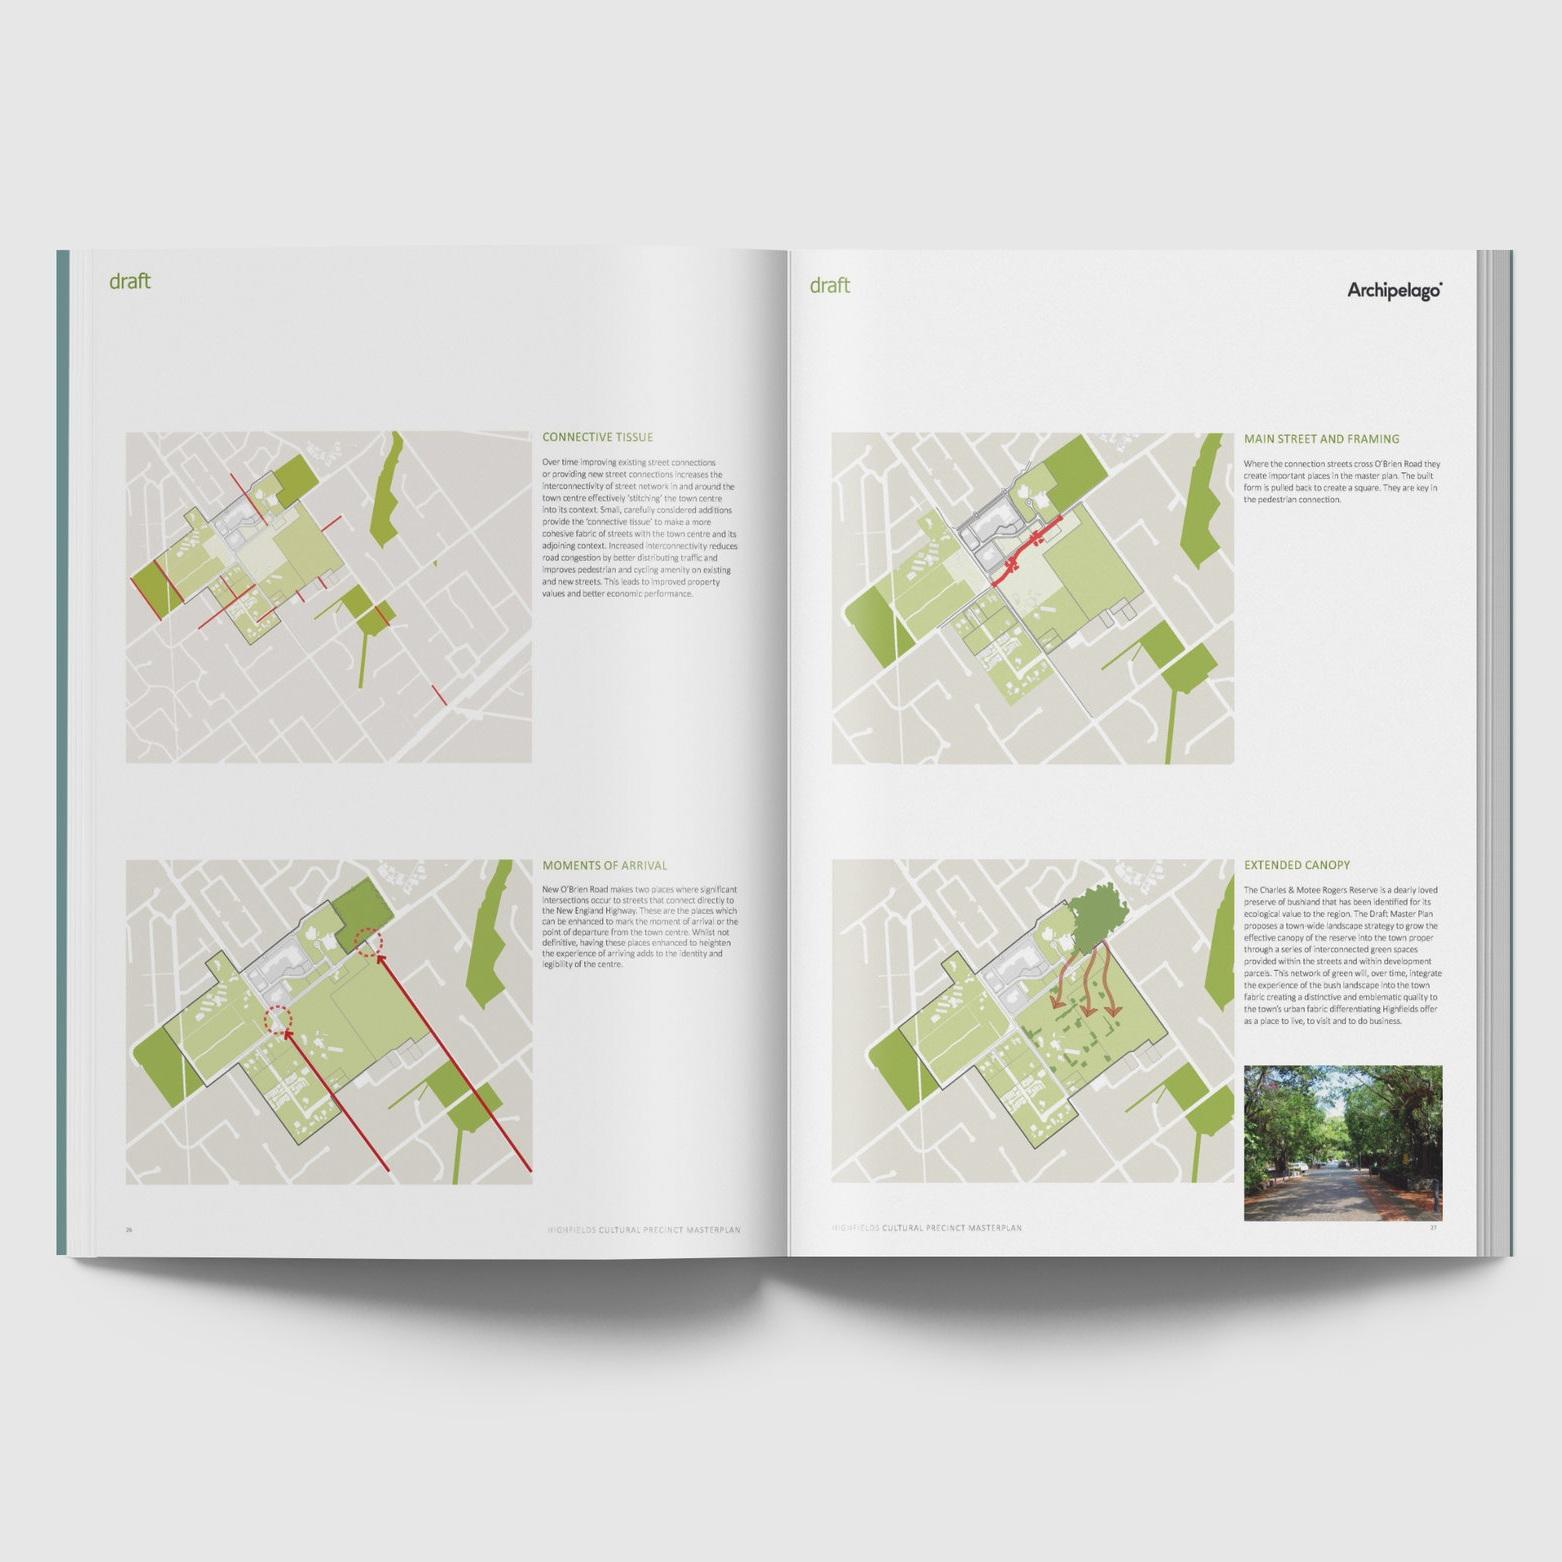 Urban+Design+Strategies+2.jpg